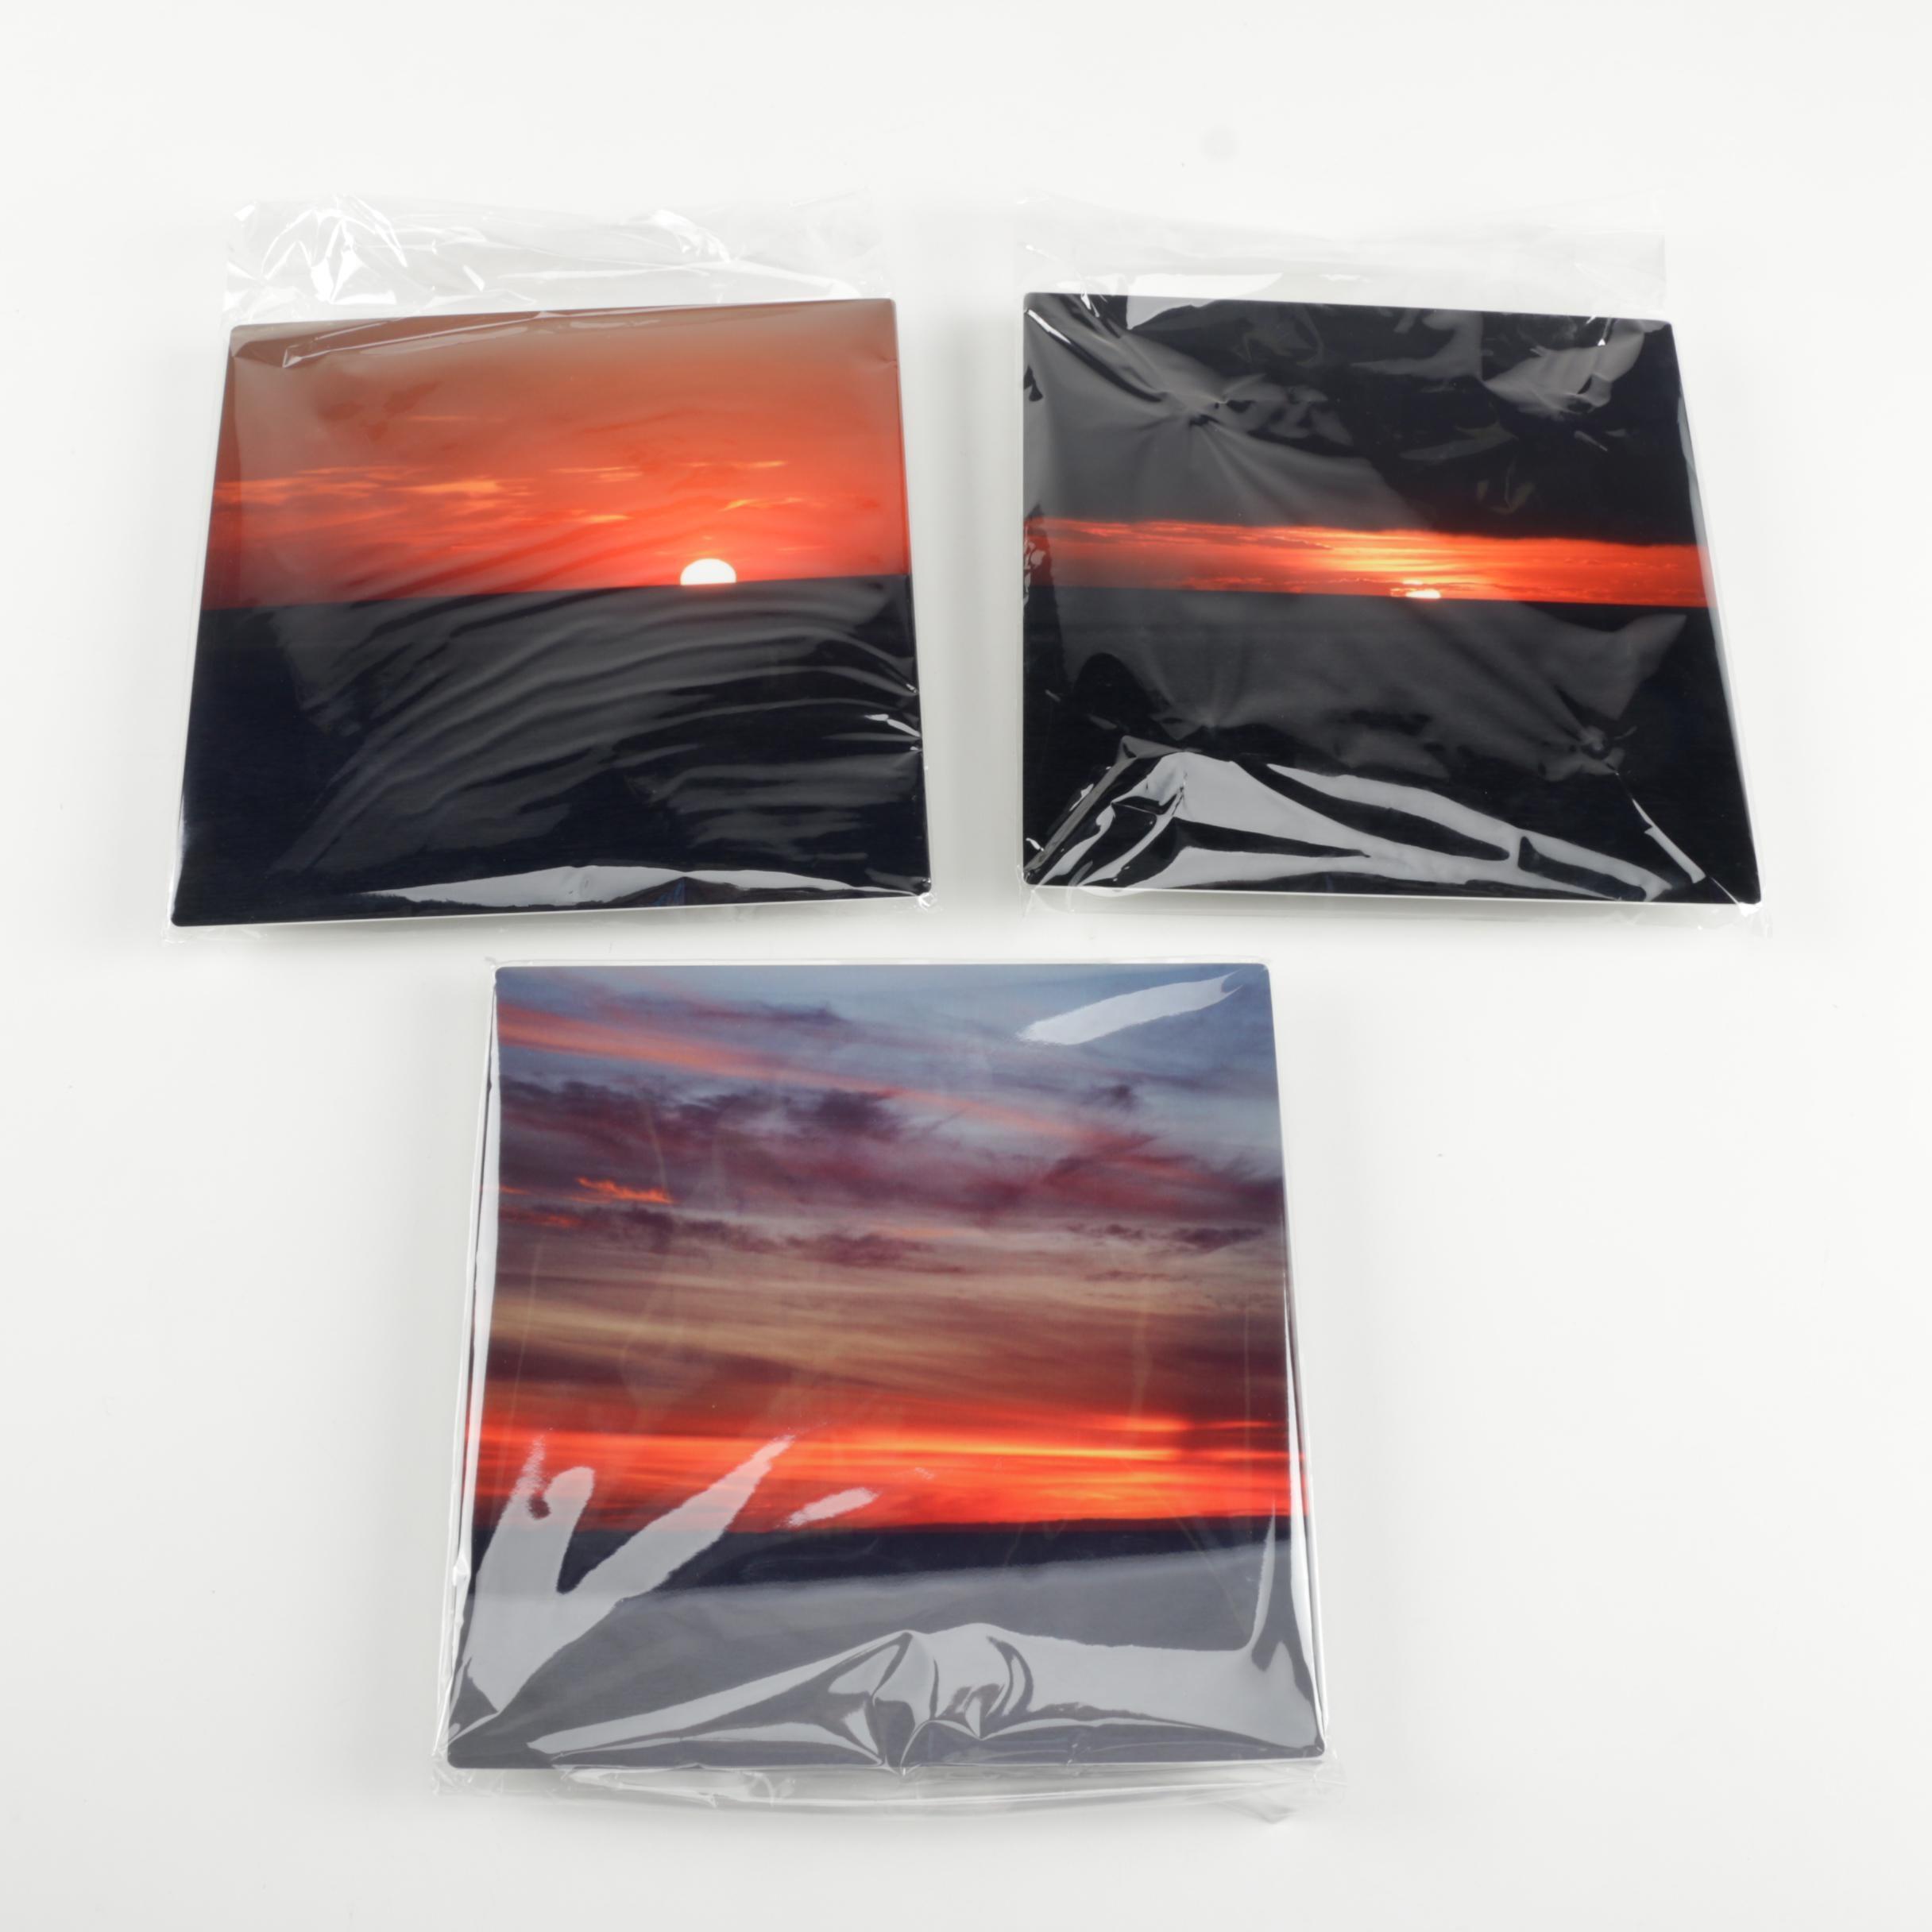 Digital Photographs of Sunsets